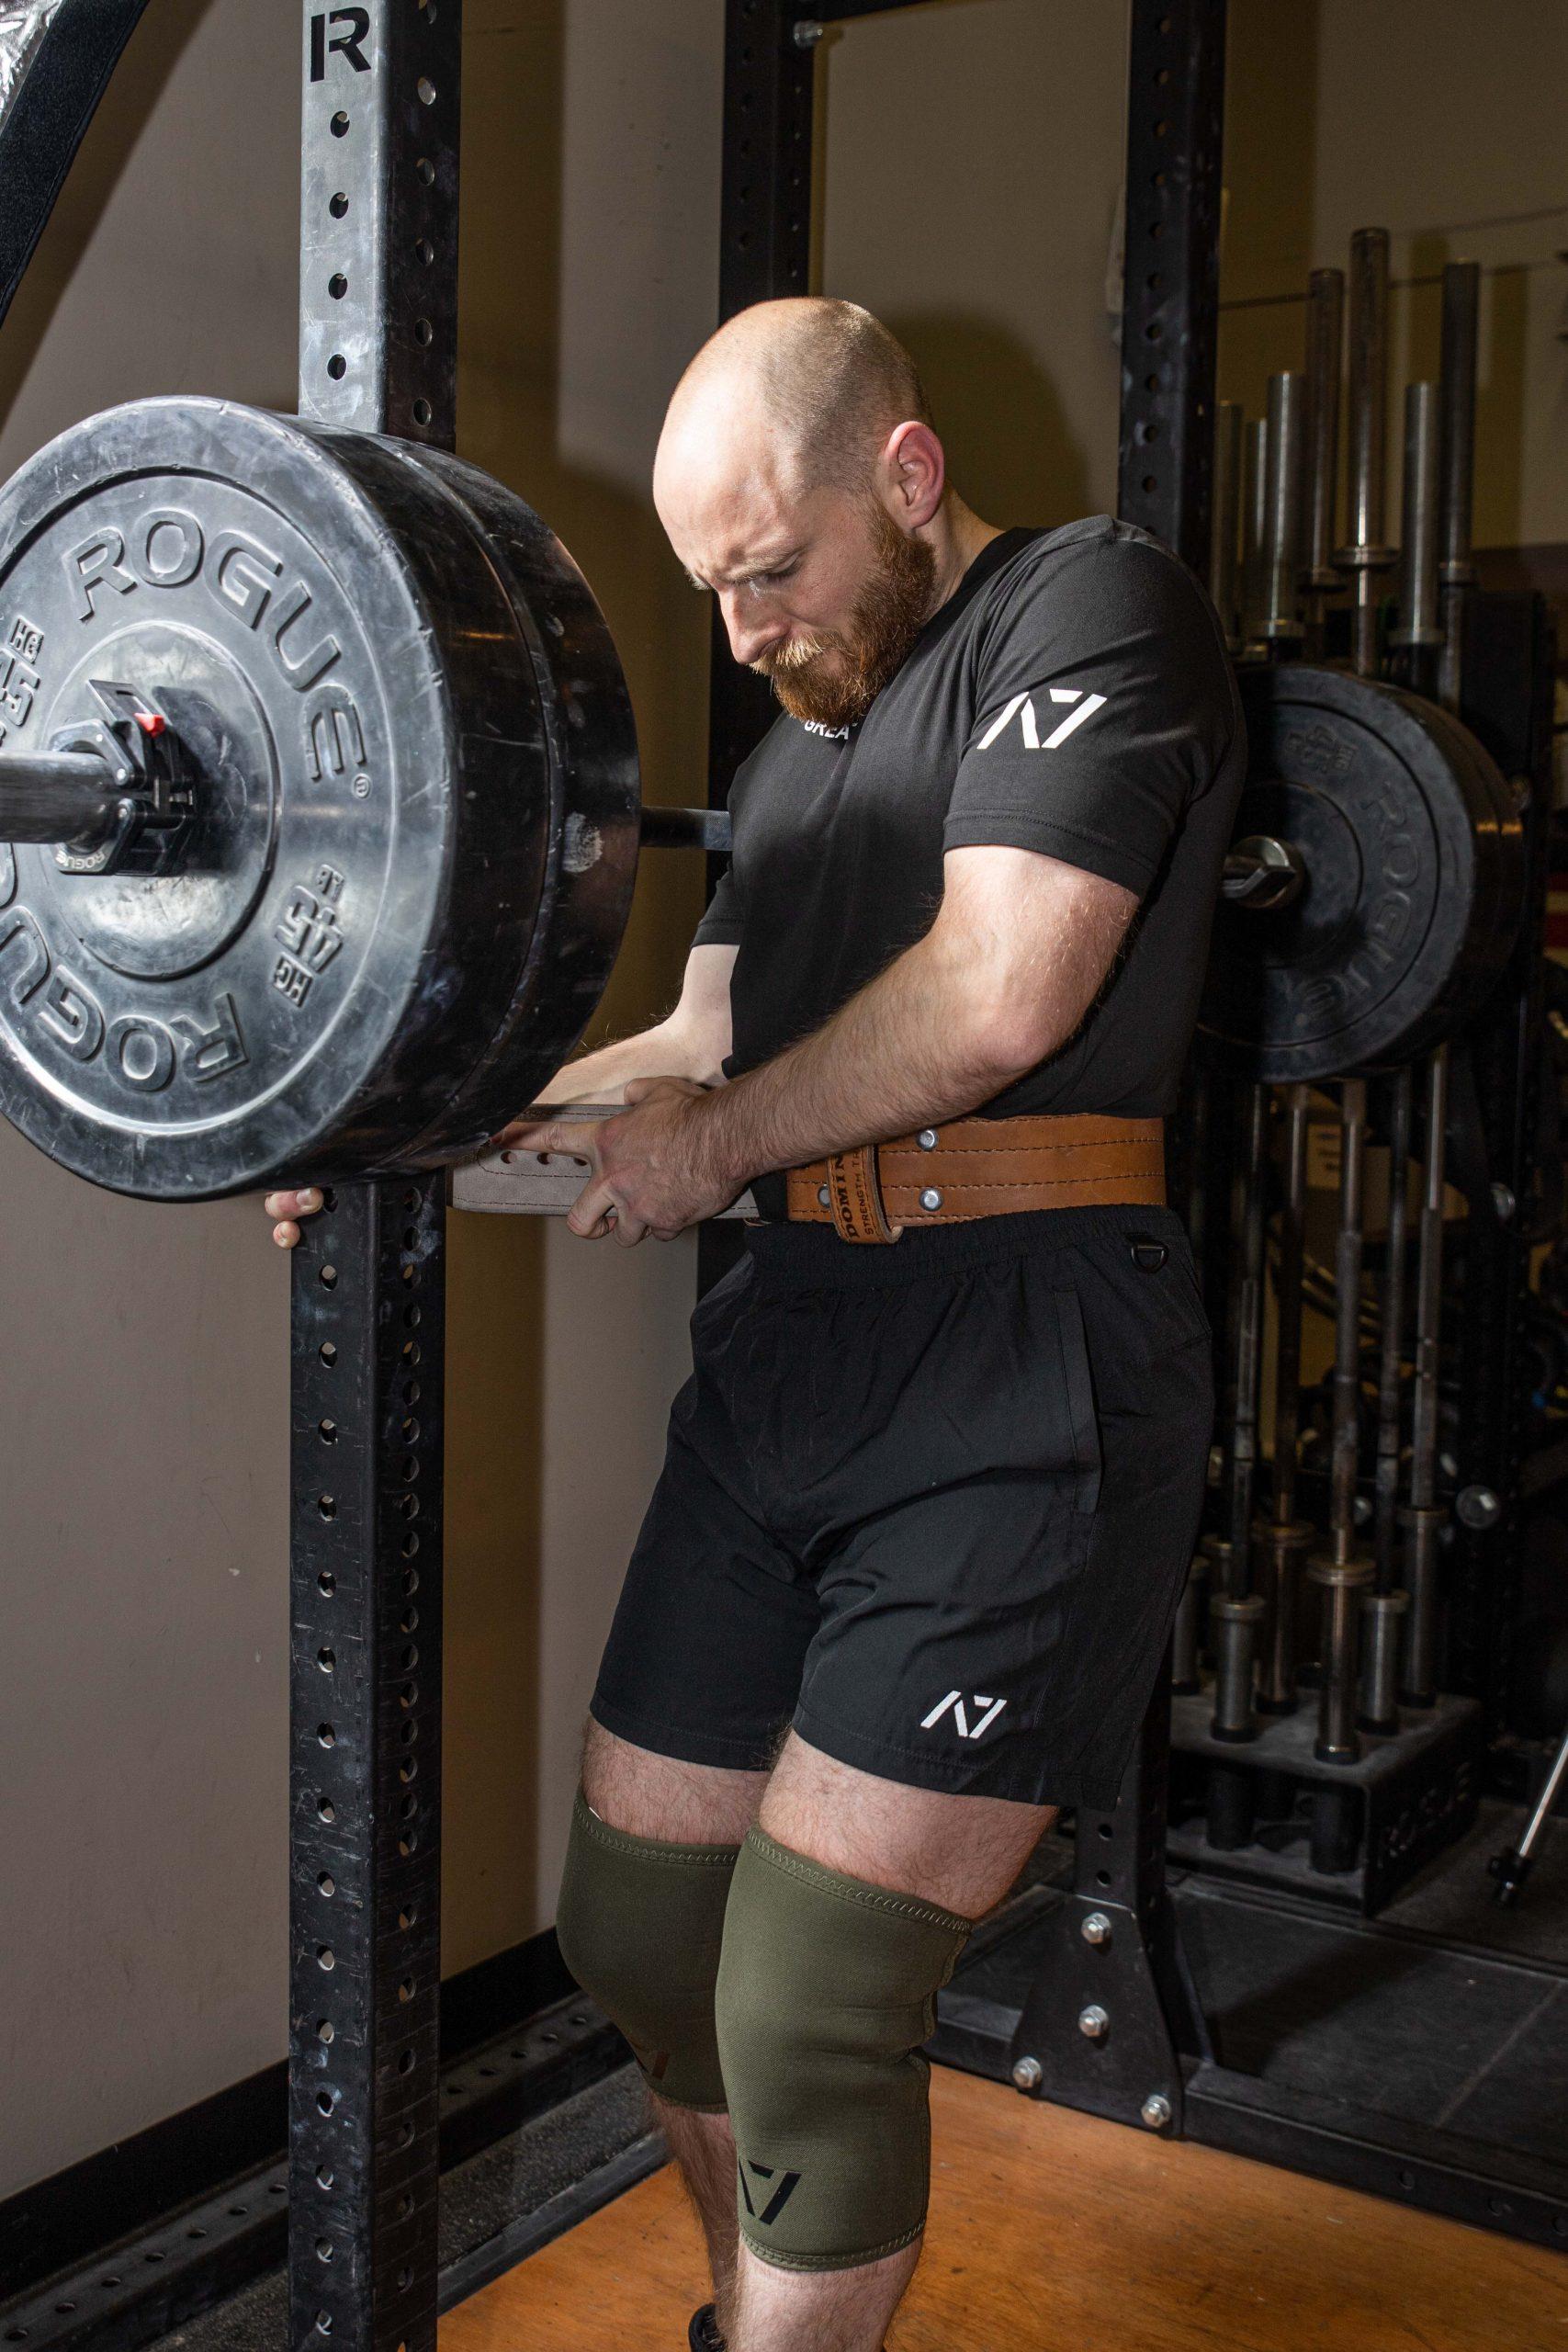 Tightening the lifting belt